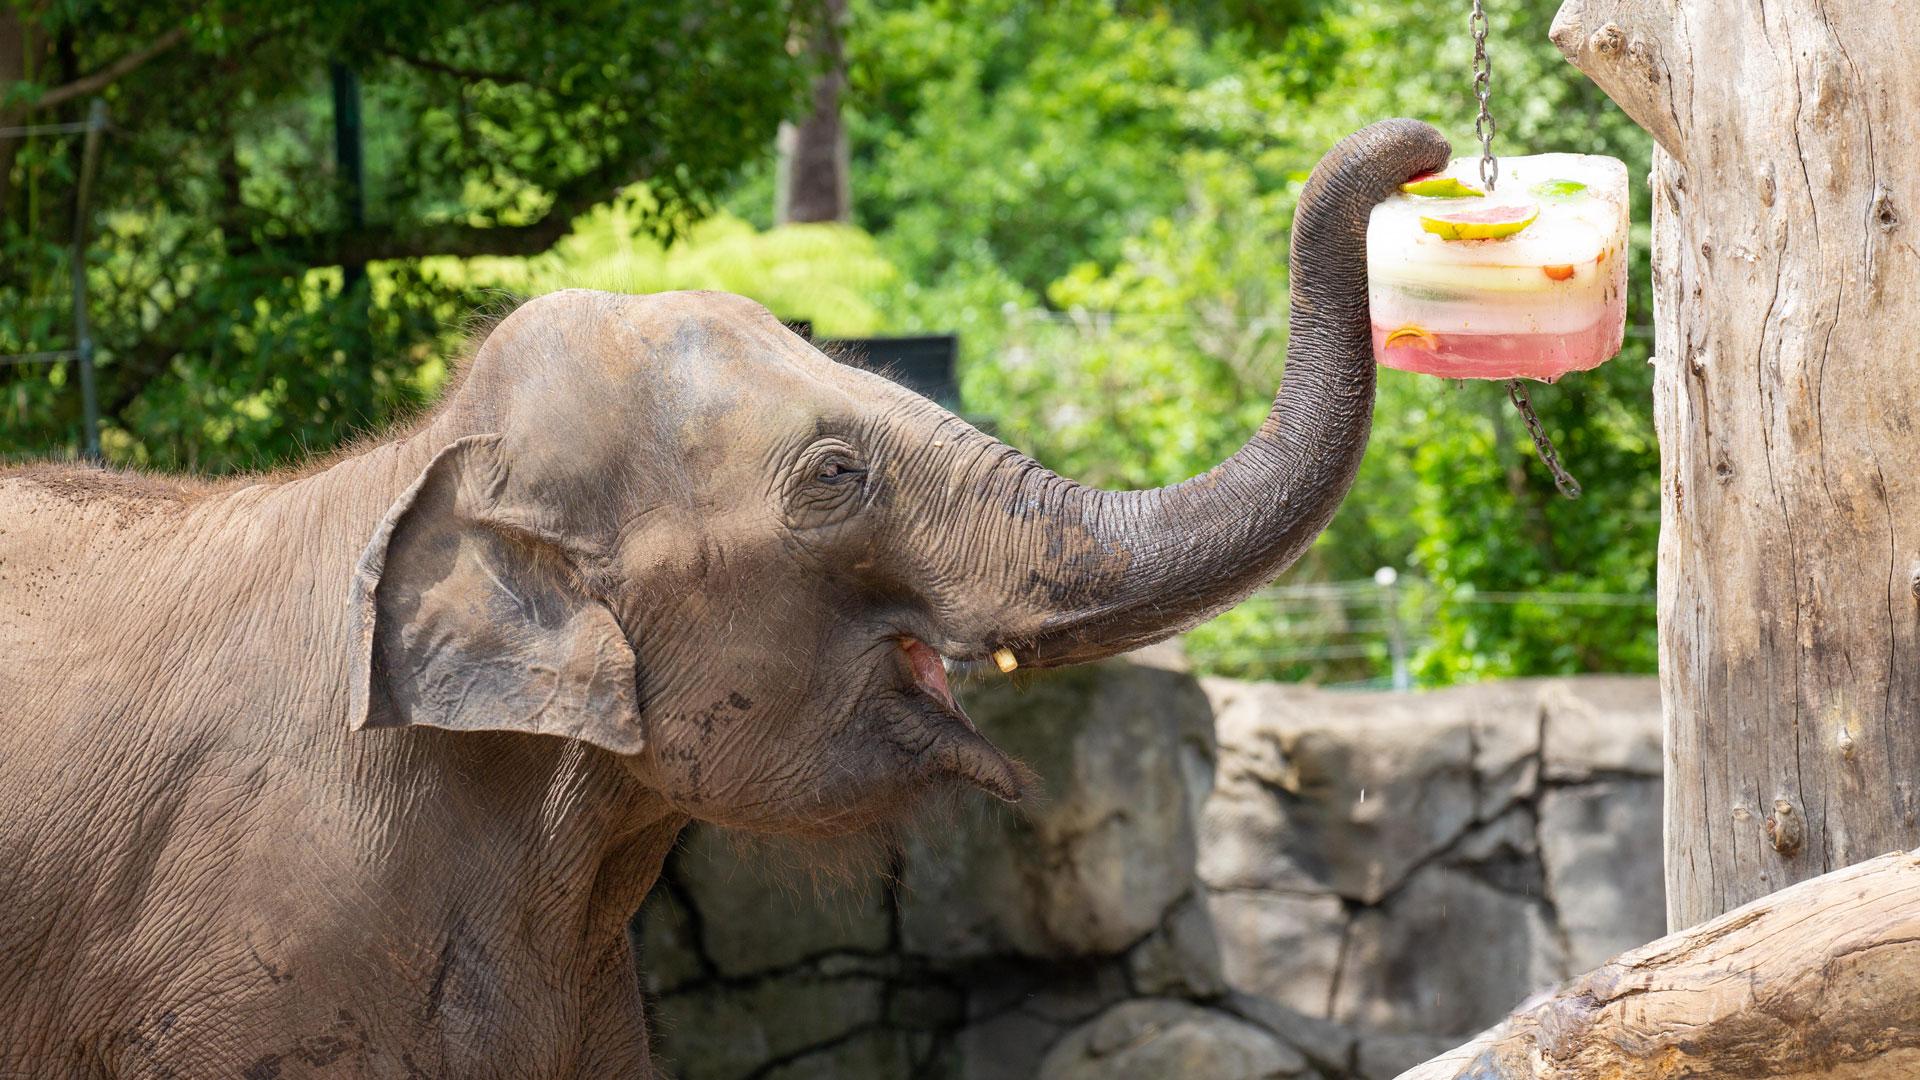 https://rfacdn.nz/zoo/assets/media/elephant-news-gallery-11.jpg